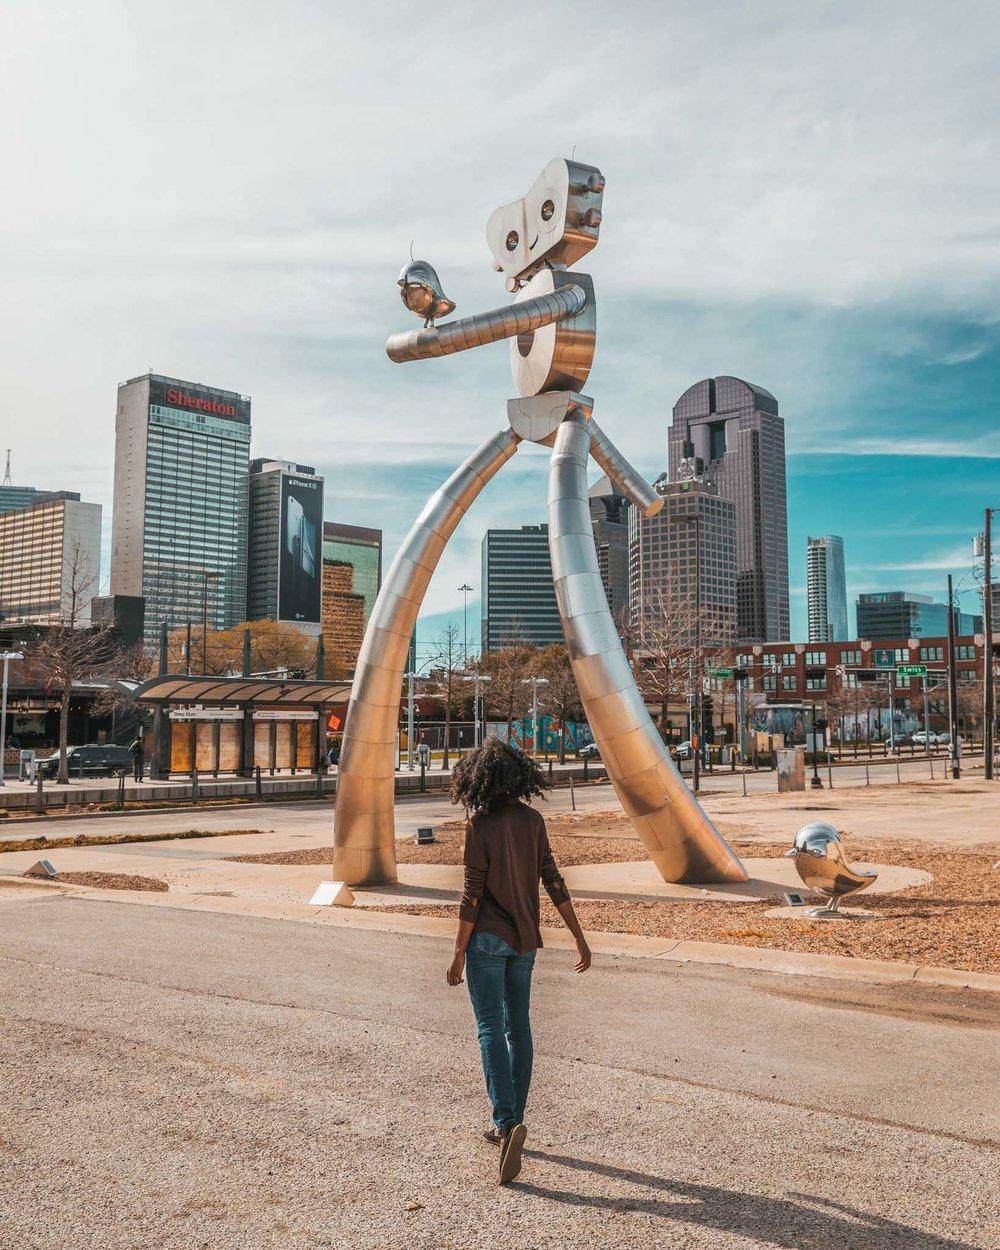 Traveling Man sculpture in Deep Ellum, Dallas, Texas